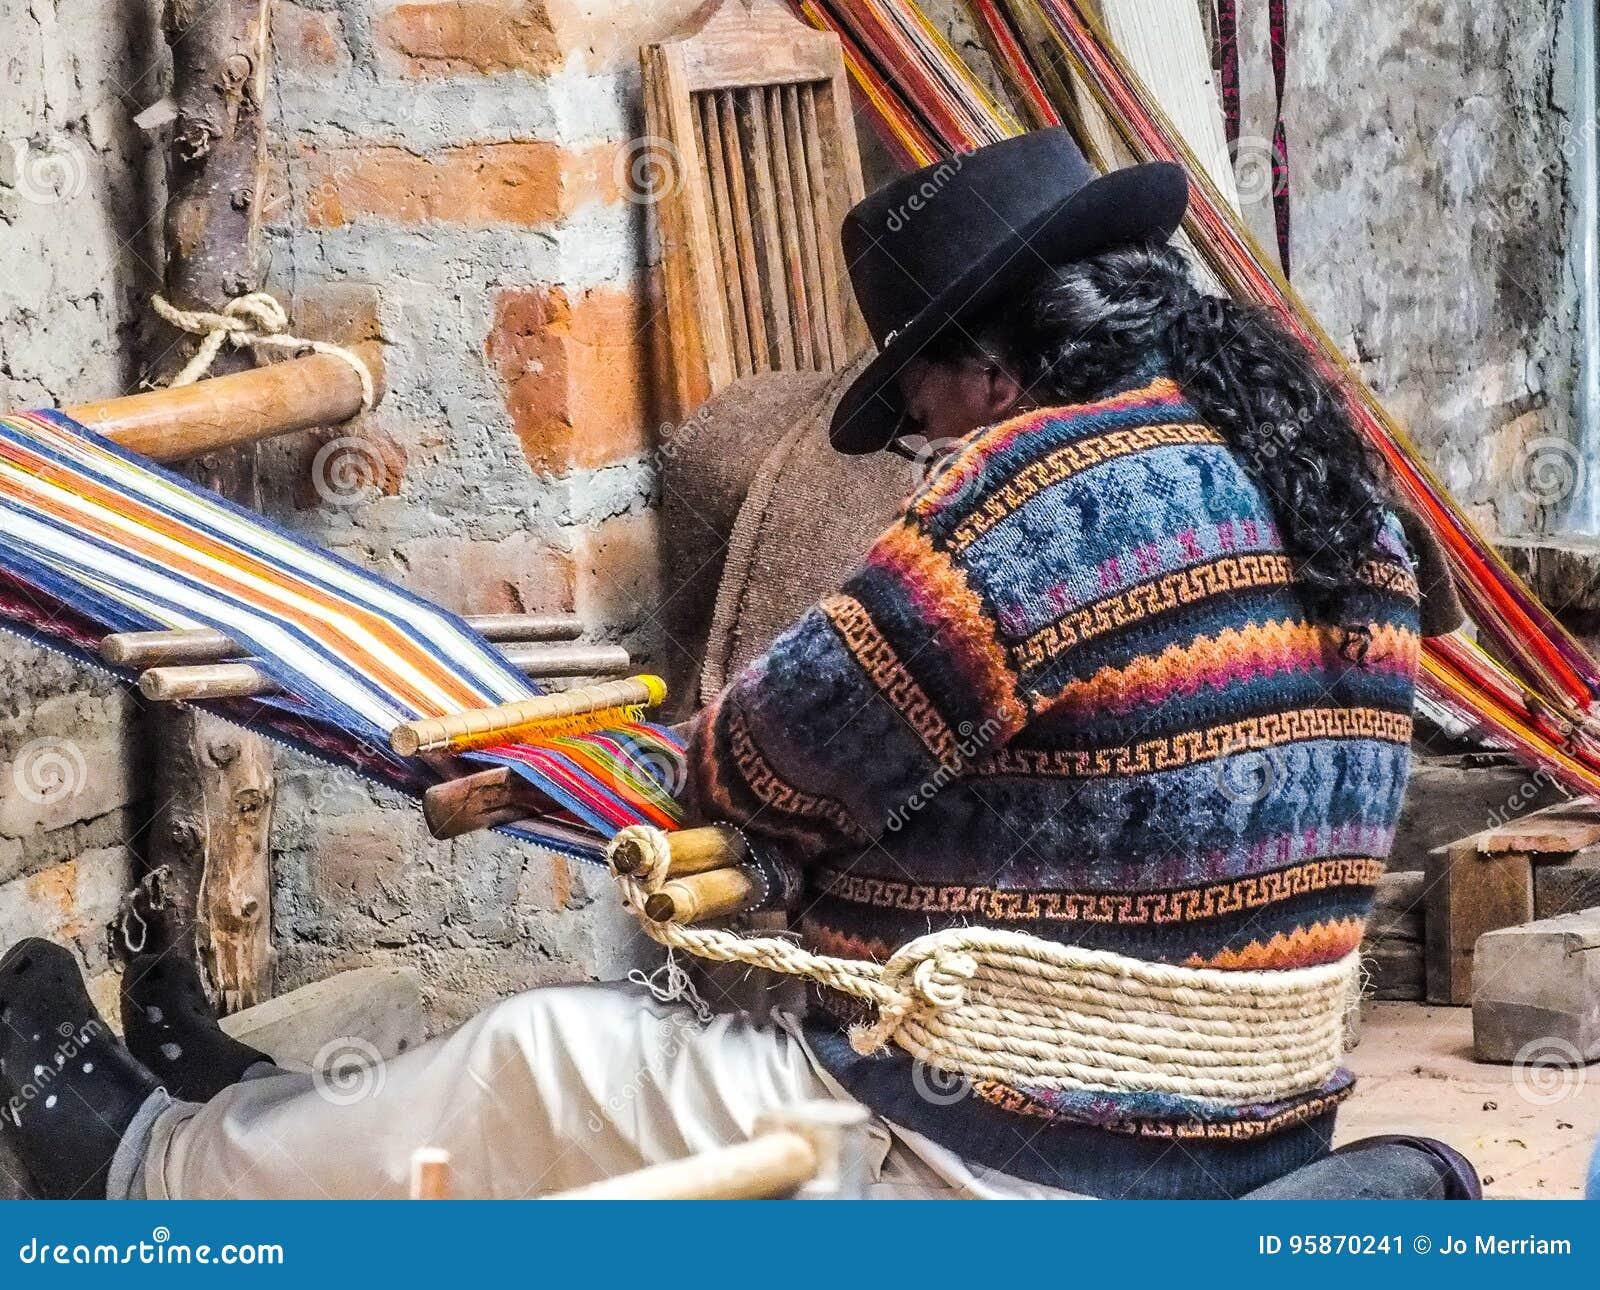 Inheemse Quechua Mensen Wevende Stof op een Backstrap-Weefgetouw